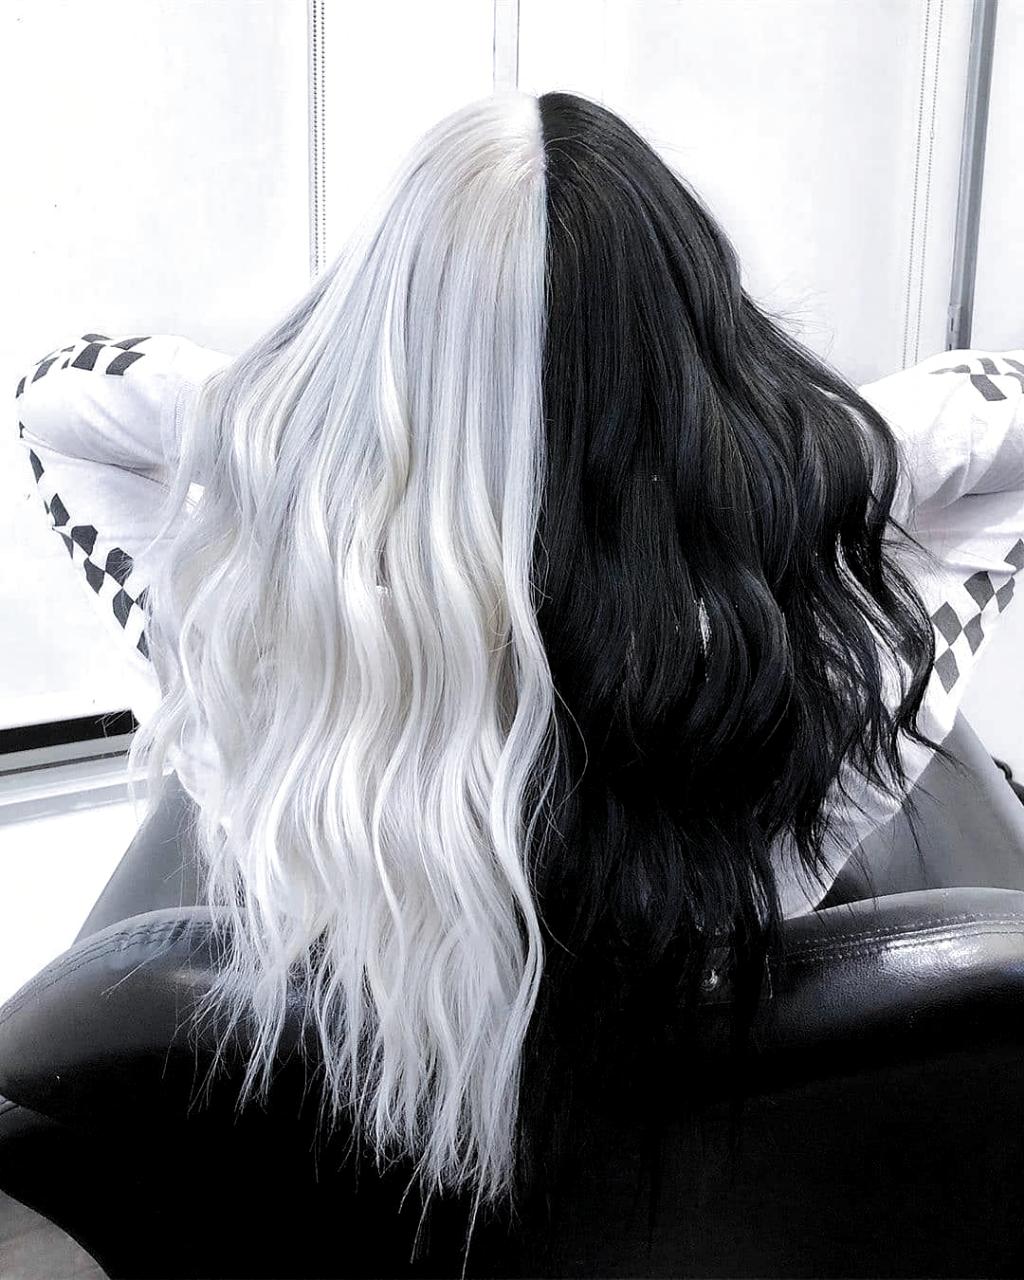 Pin By Piuugh On Hair Hair Styles Split Dyed Hair Hair Dye Colors